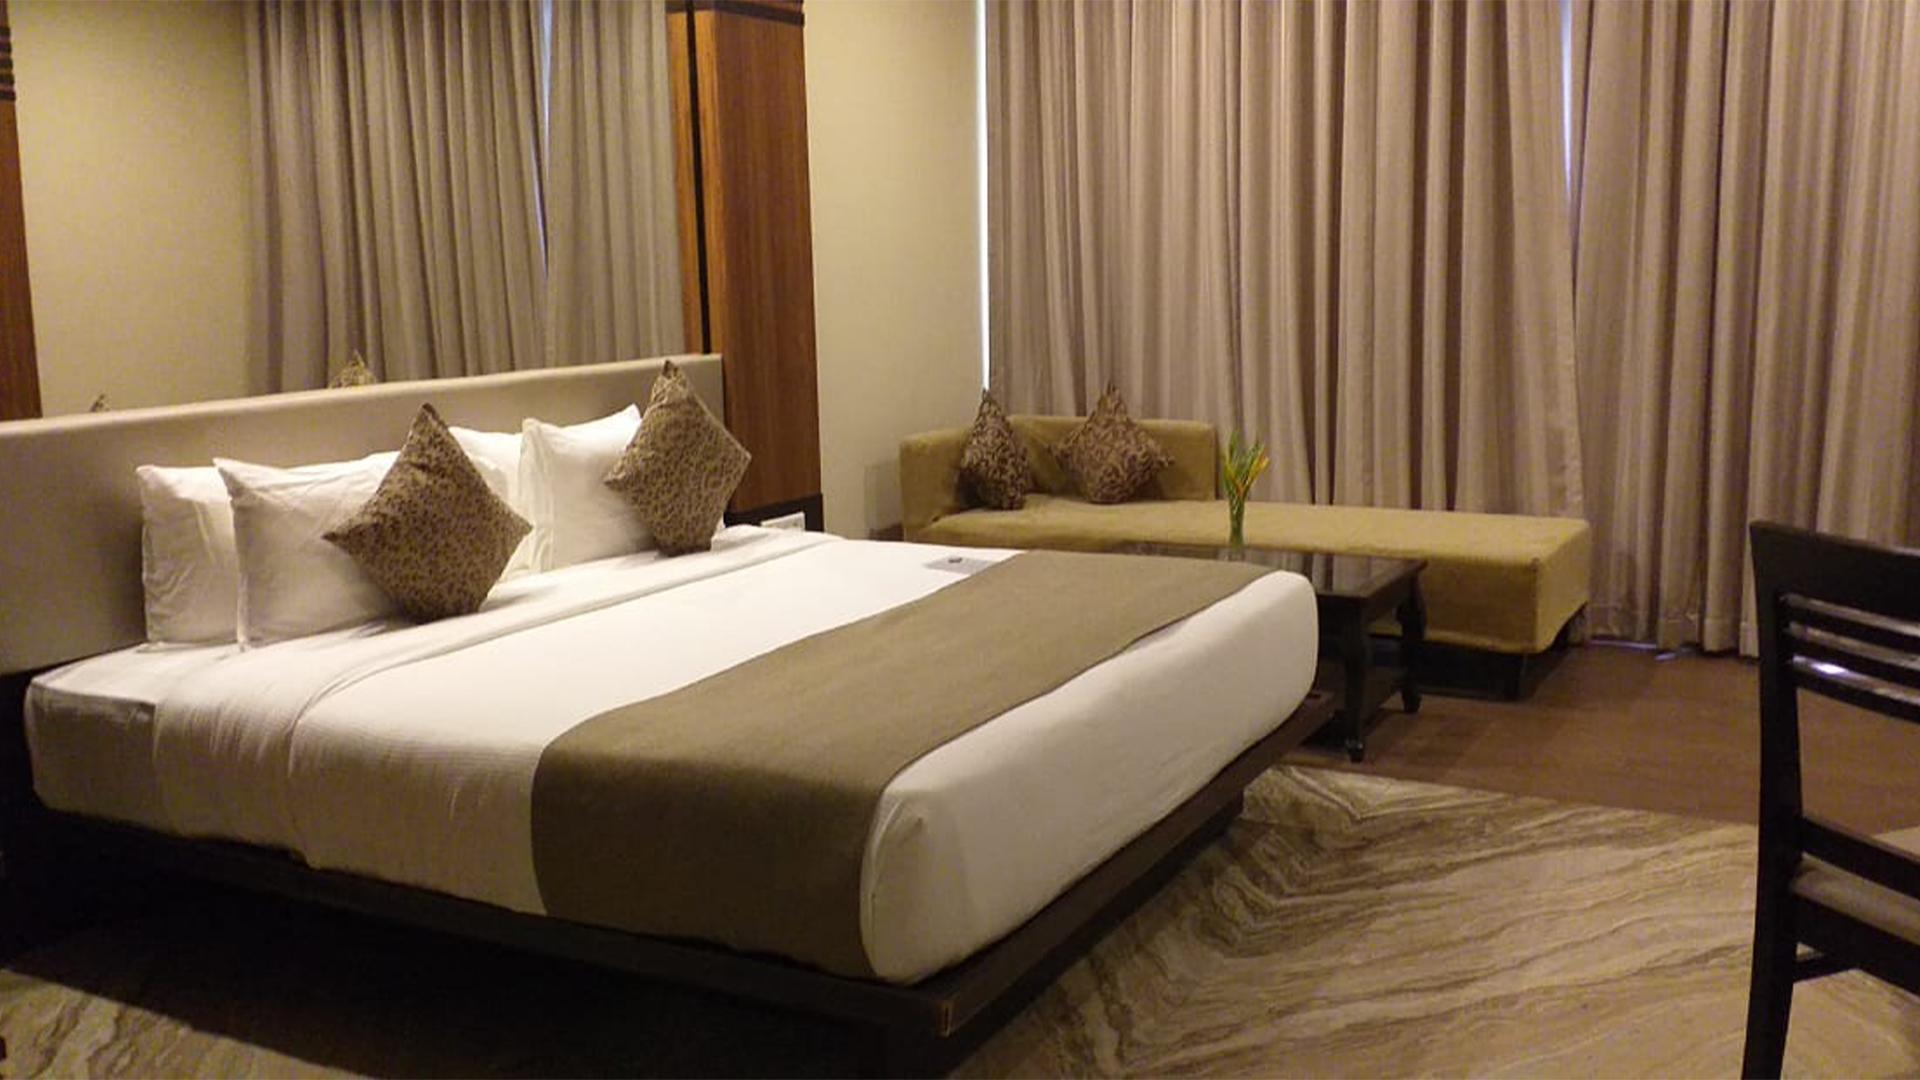 Superior Room image 1 at Resort Rio by North Goa, Goa, India